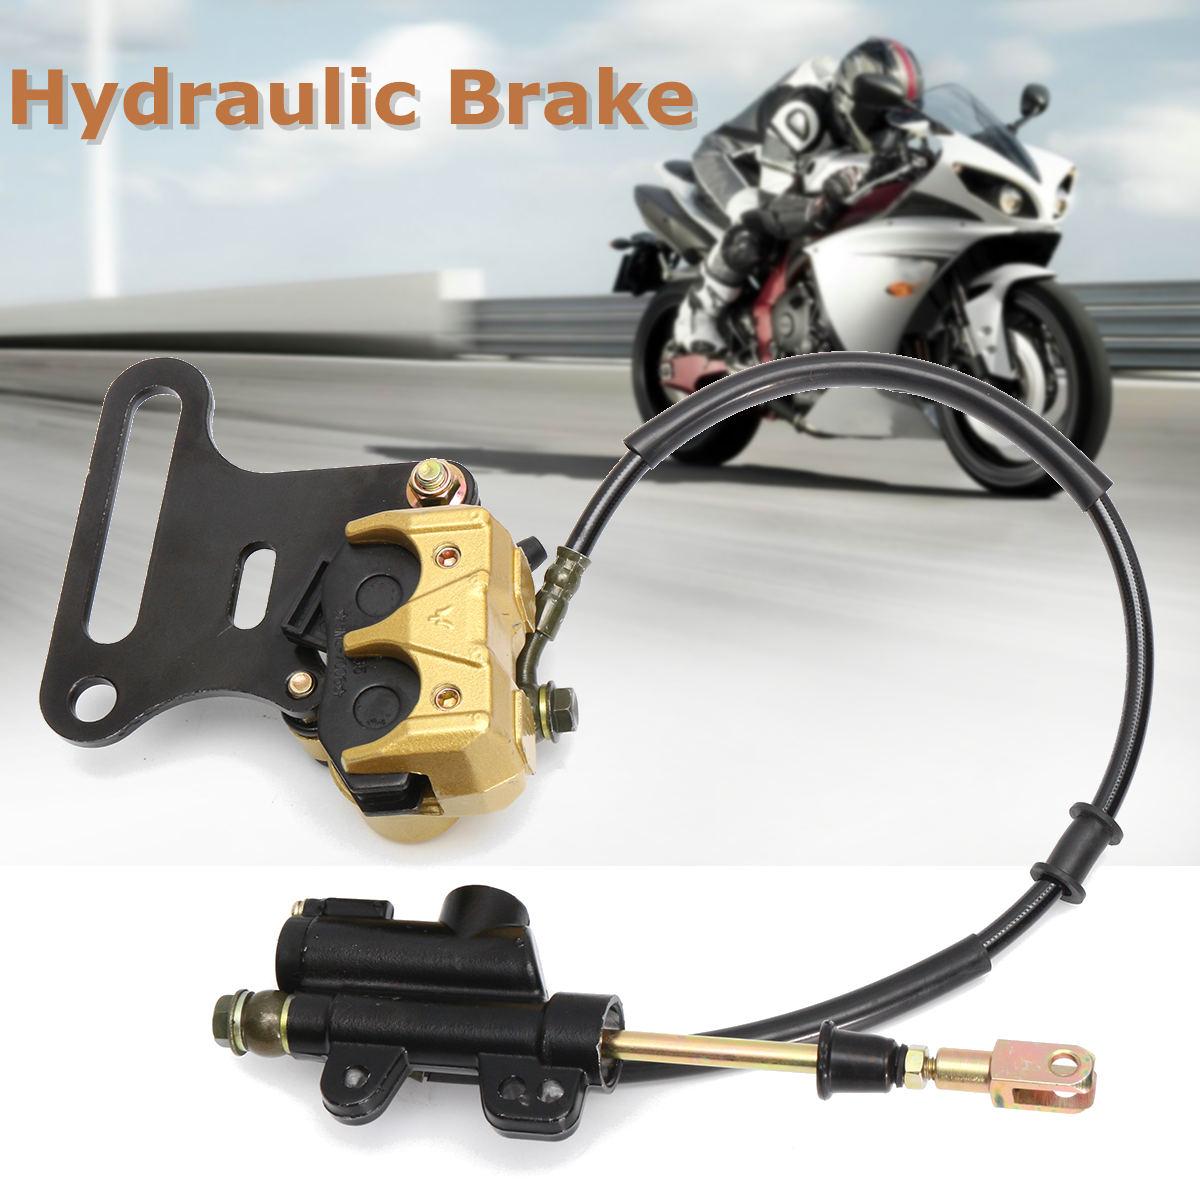 Hydraulic Rear Disc Brake Caliper System 110 125cc 140cc PIT PRO Dirt Bike 12mm